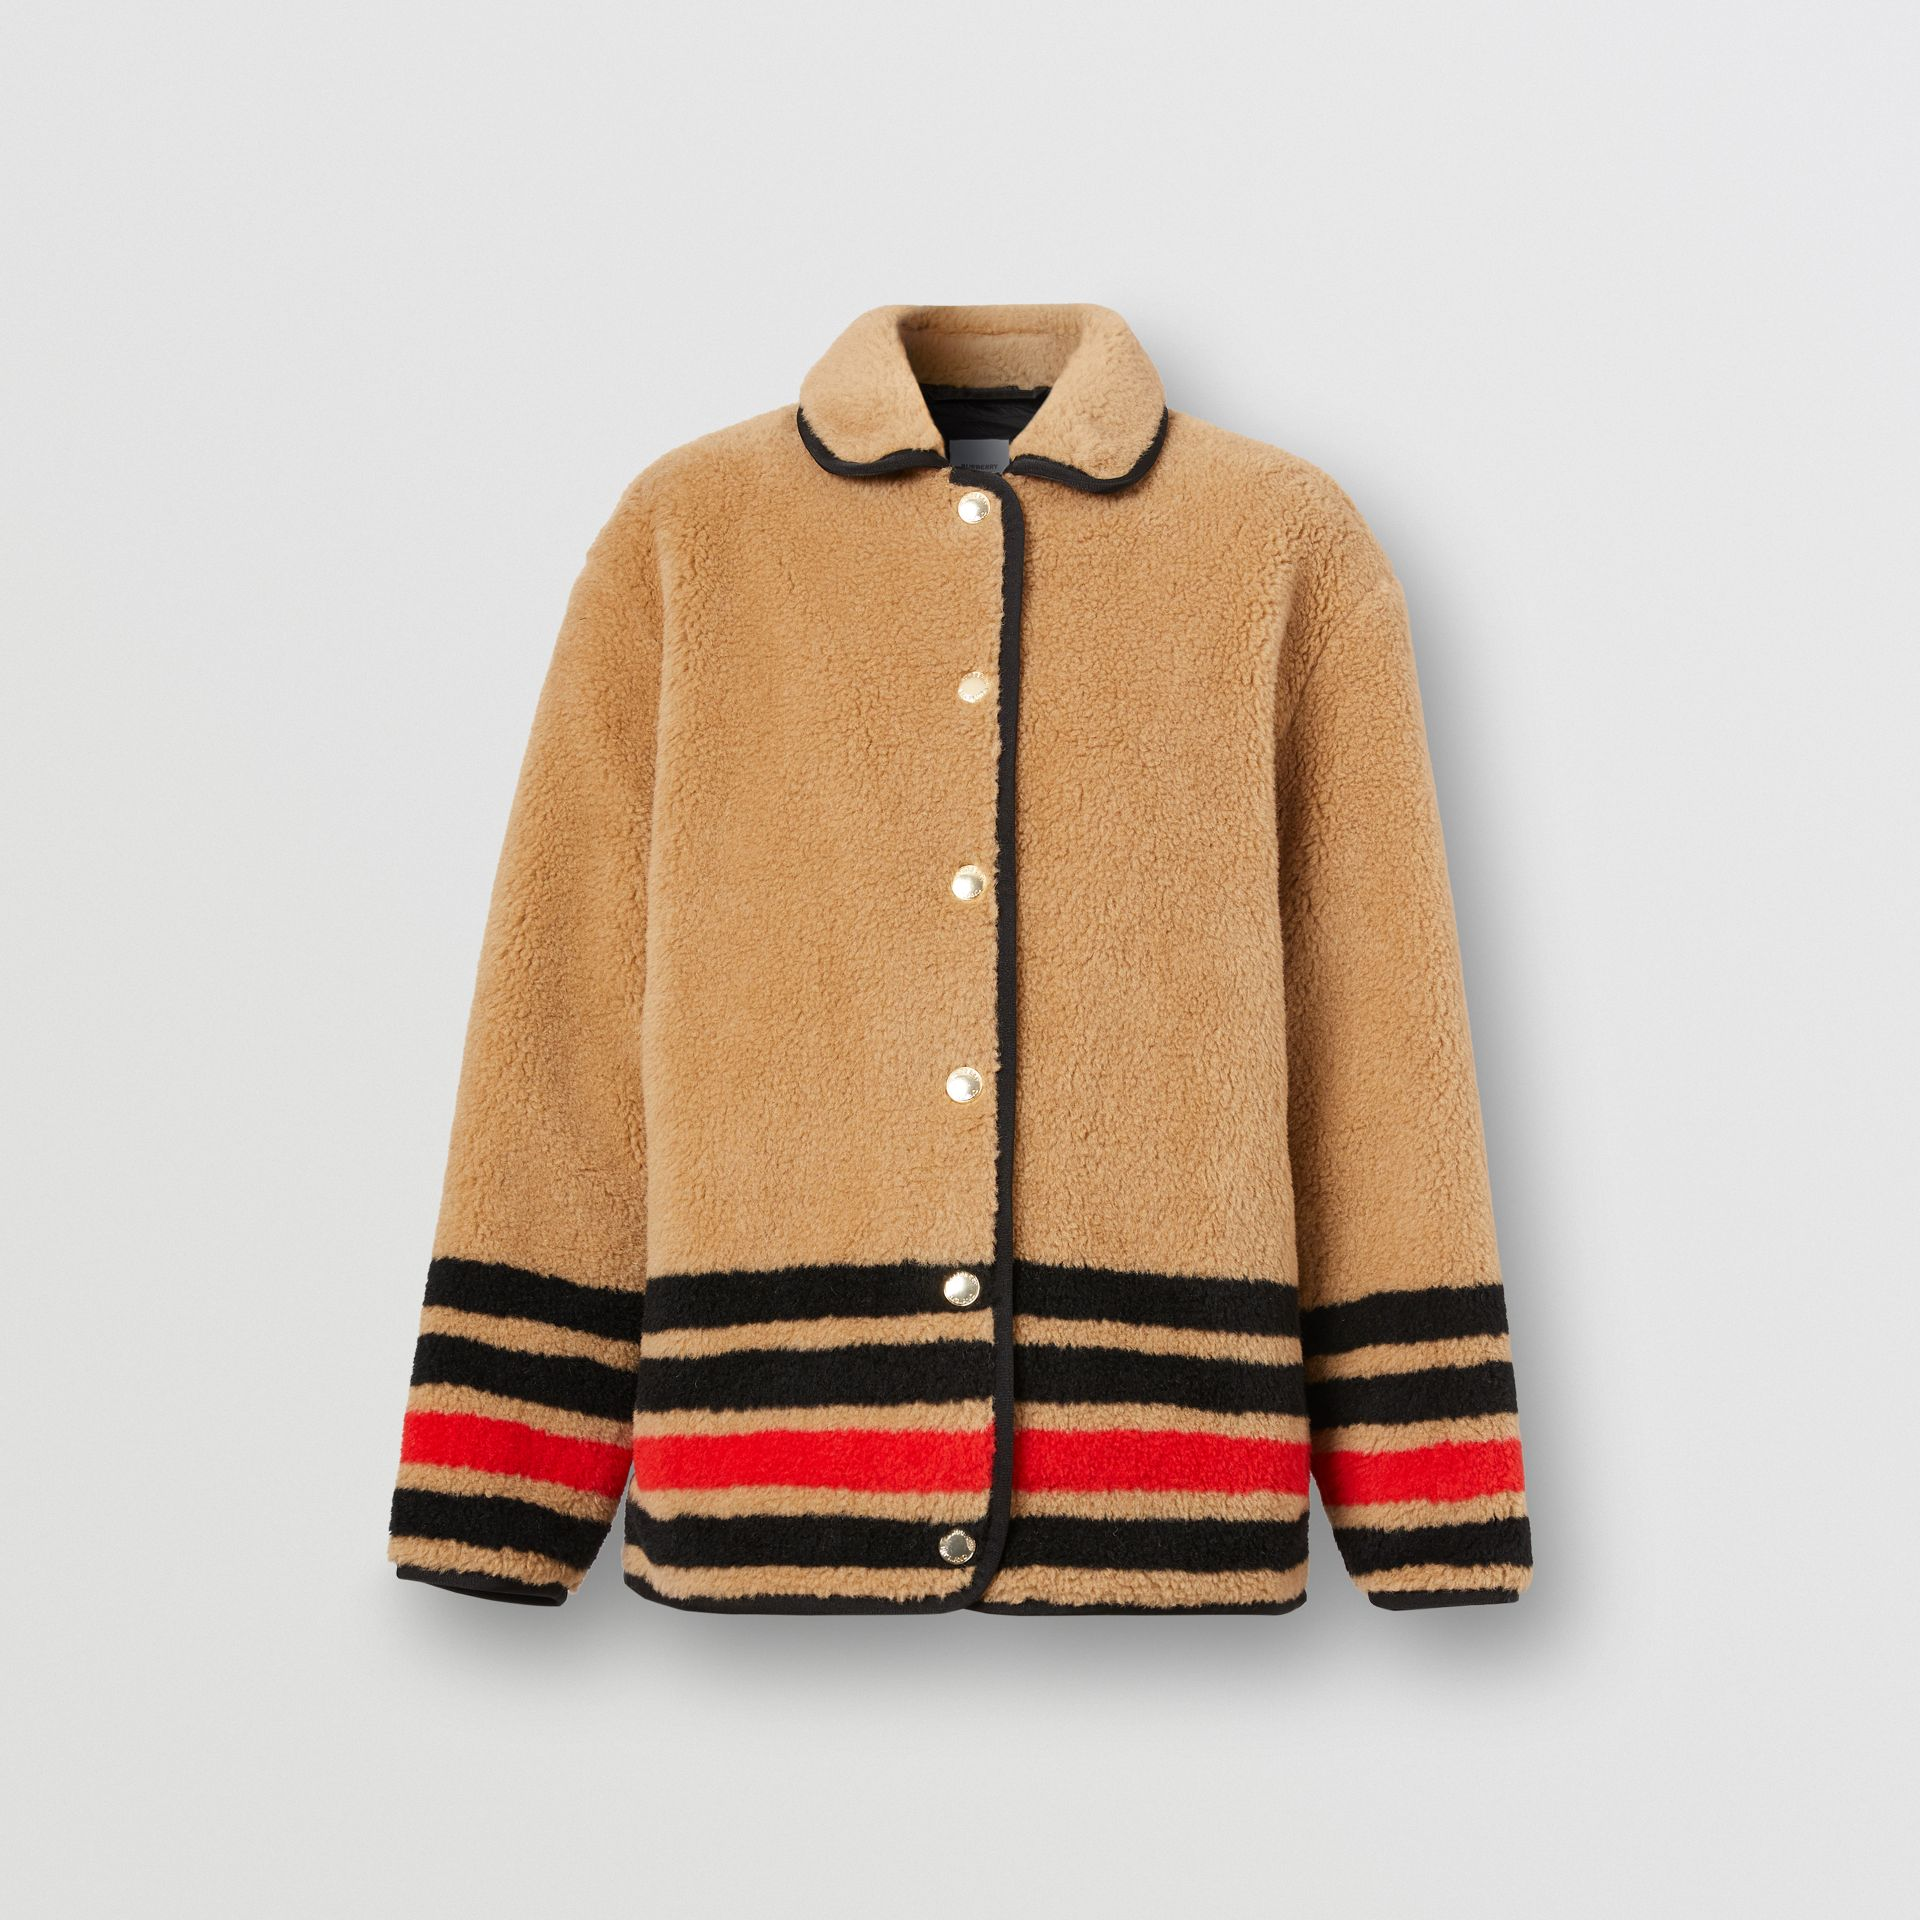 Stripe Intarsia Fleece Jacket in Light Camel - Women | Burberry - gallery image 3